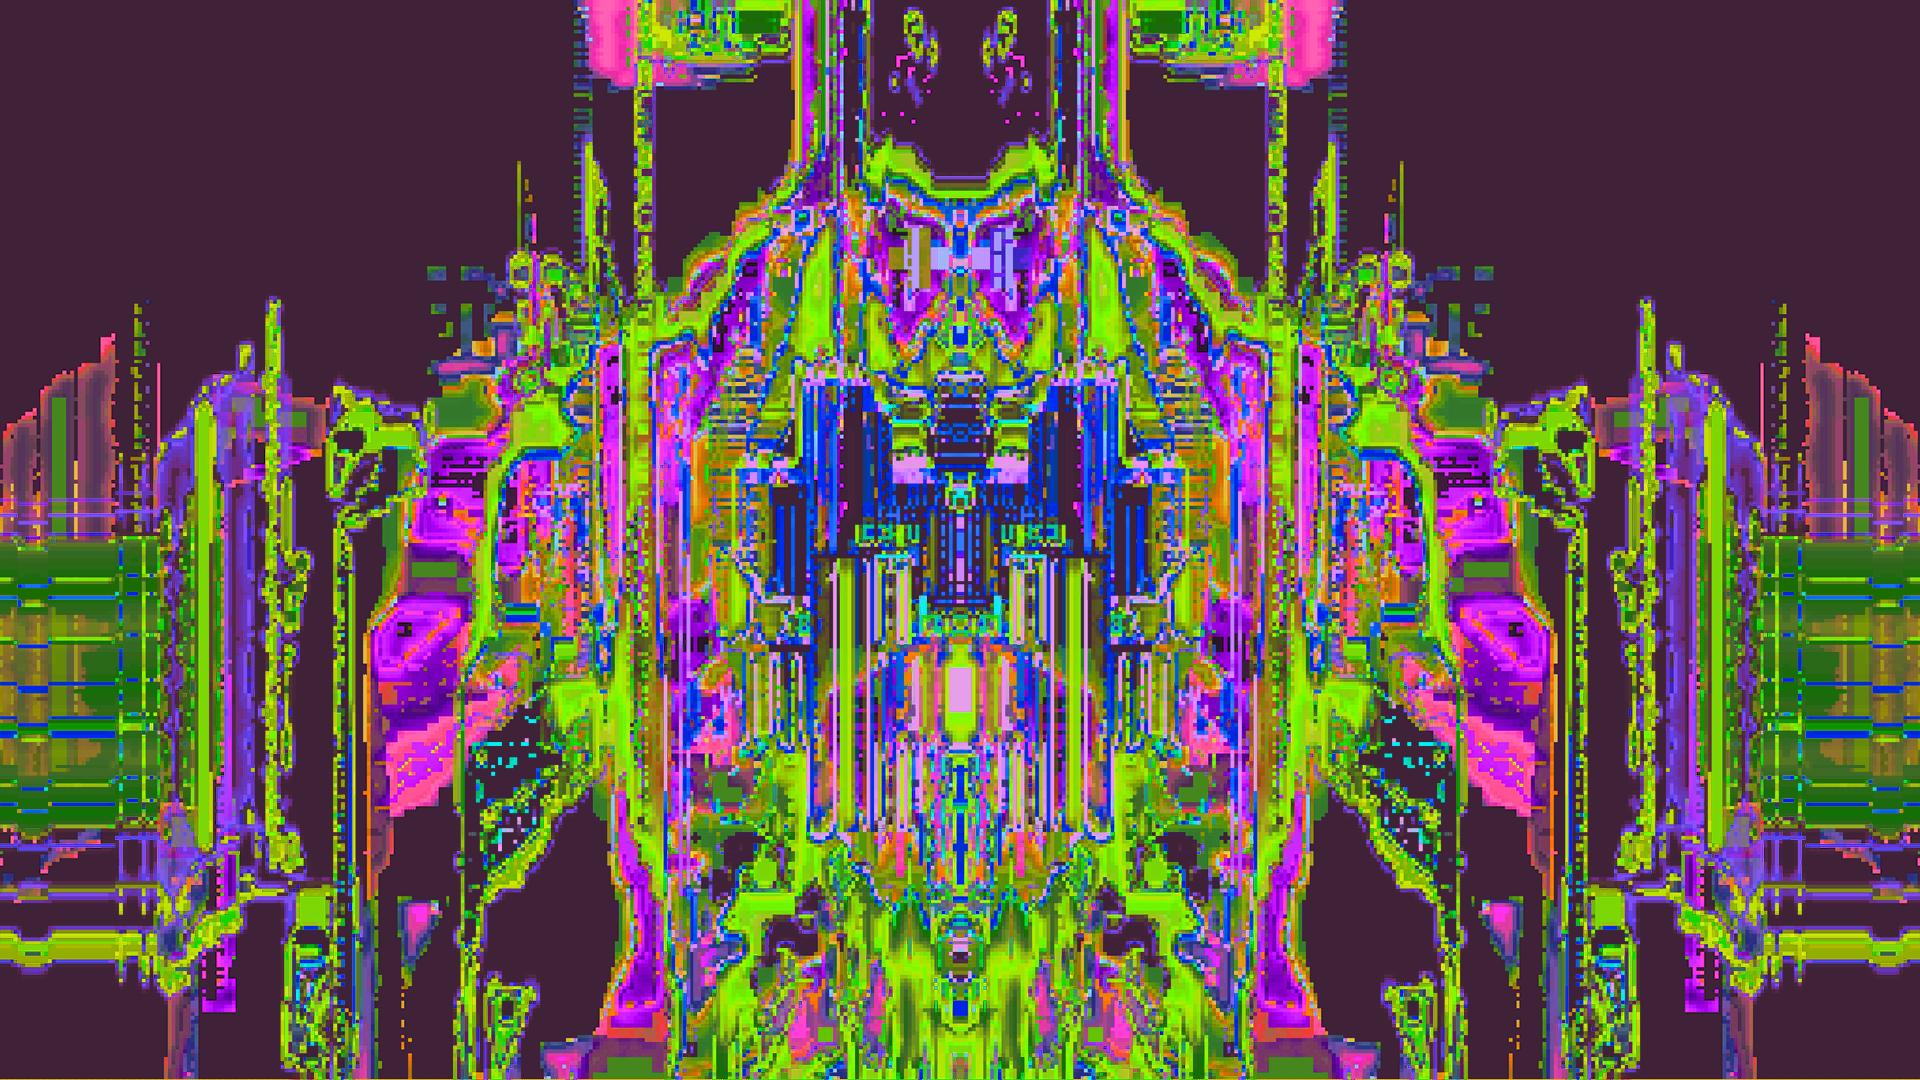 STRANGETHINK ART MACHINE